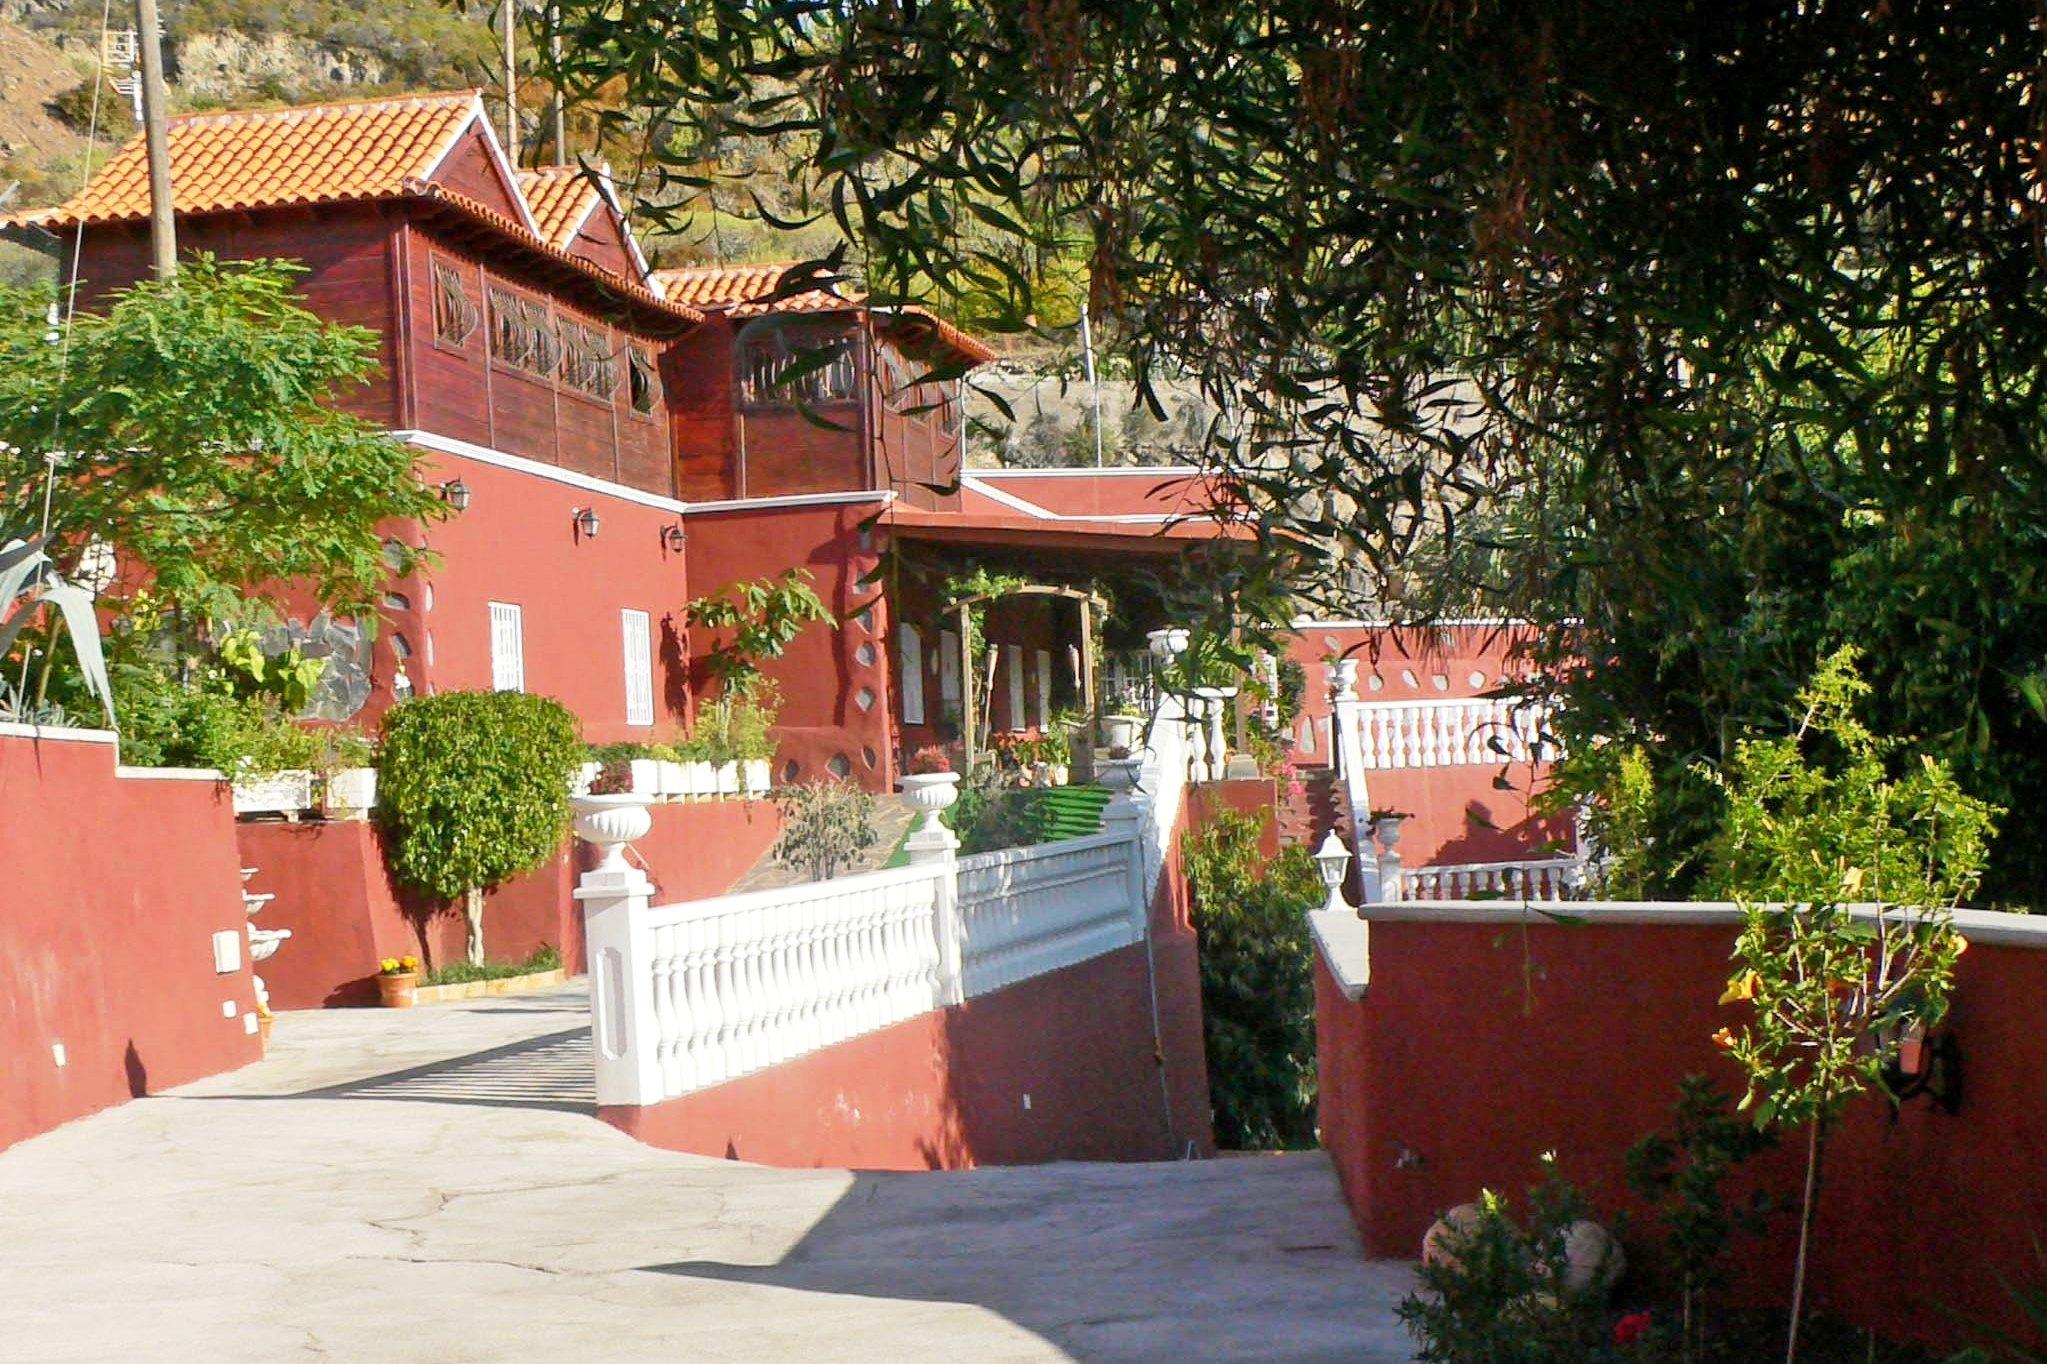 Acheter une maison à Tenerife Calabria